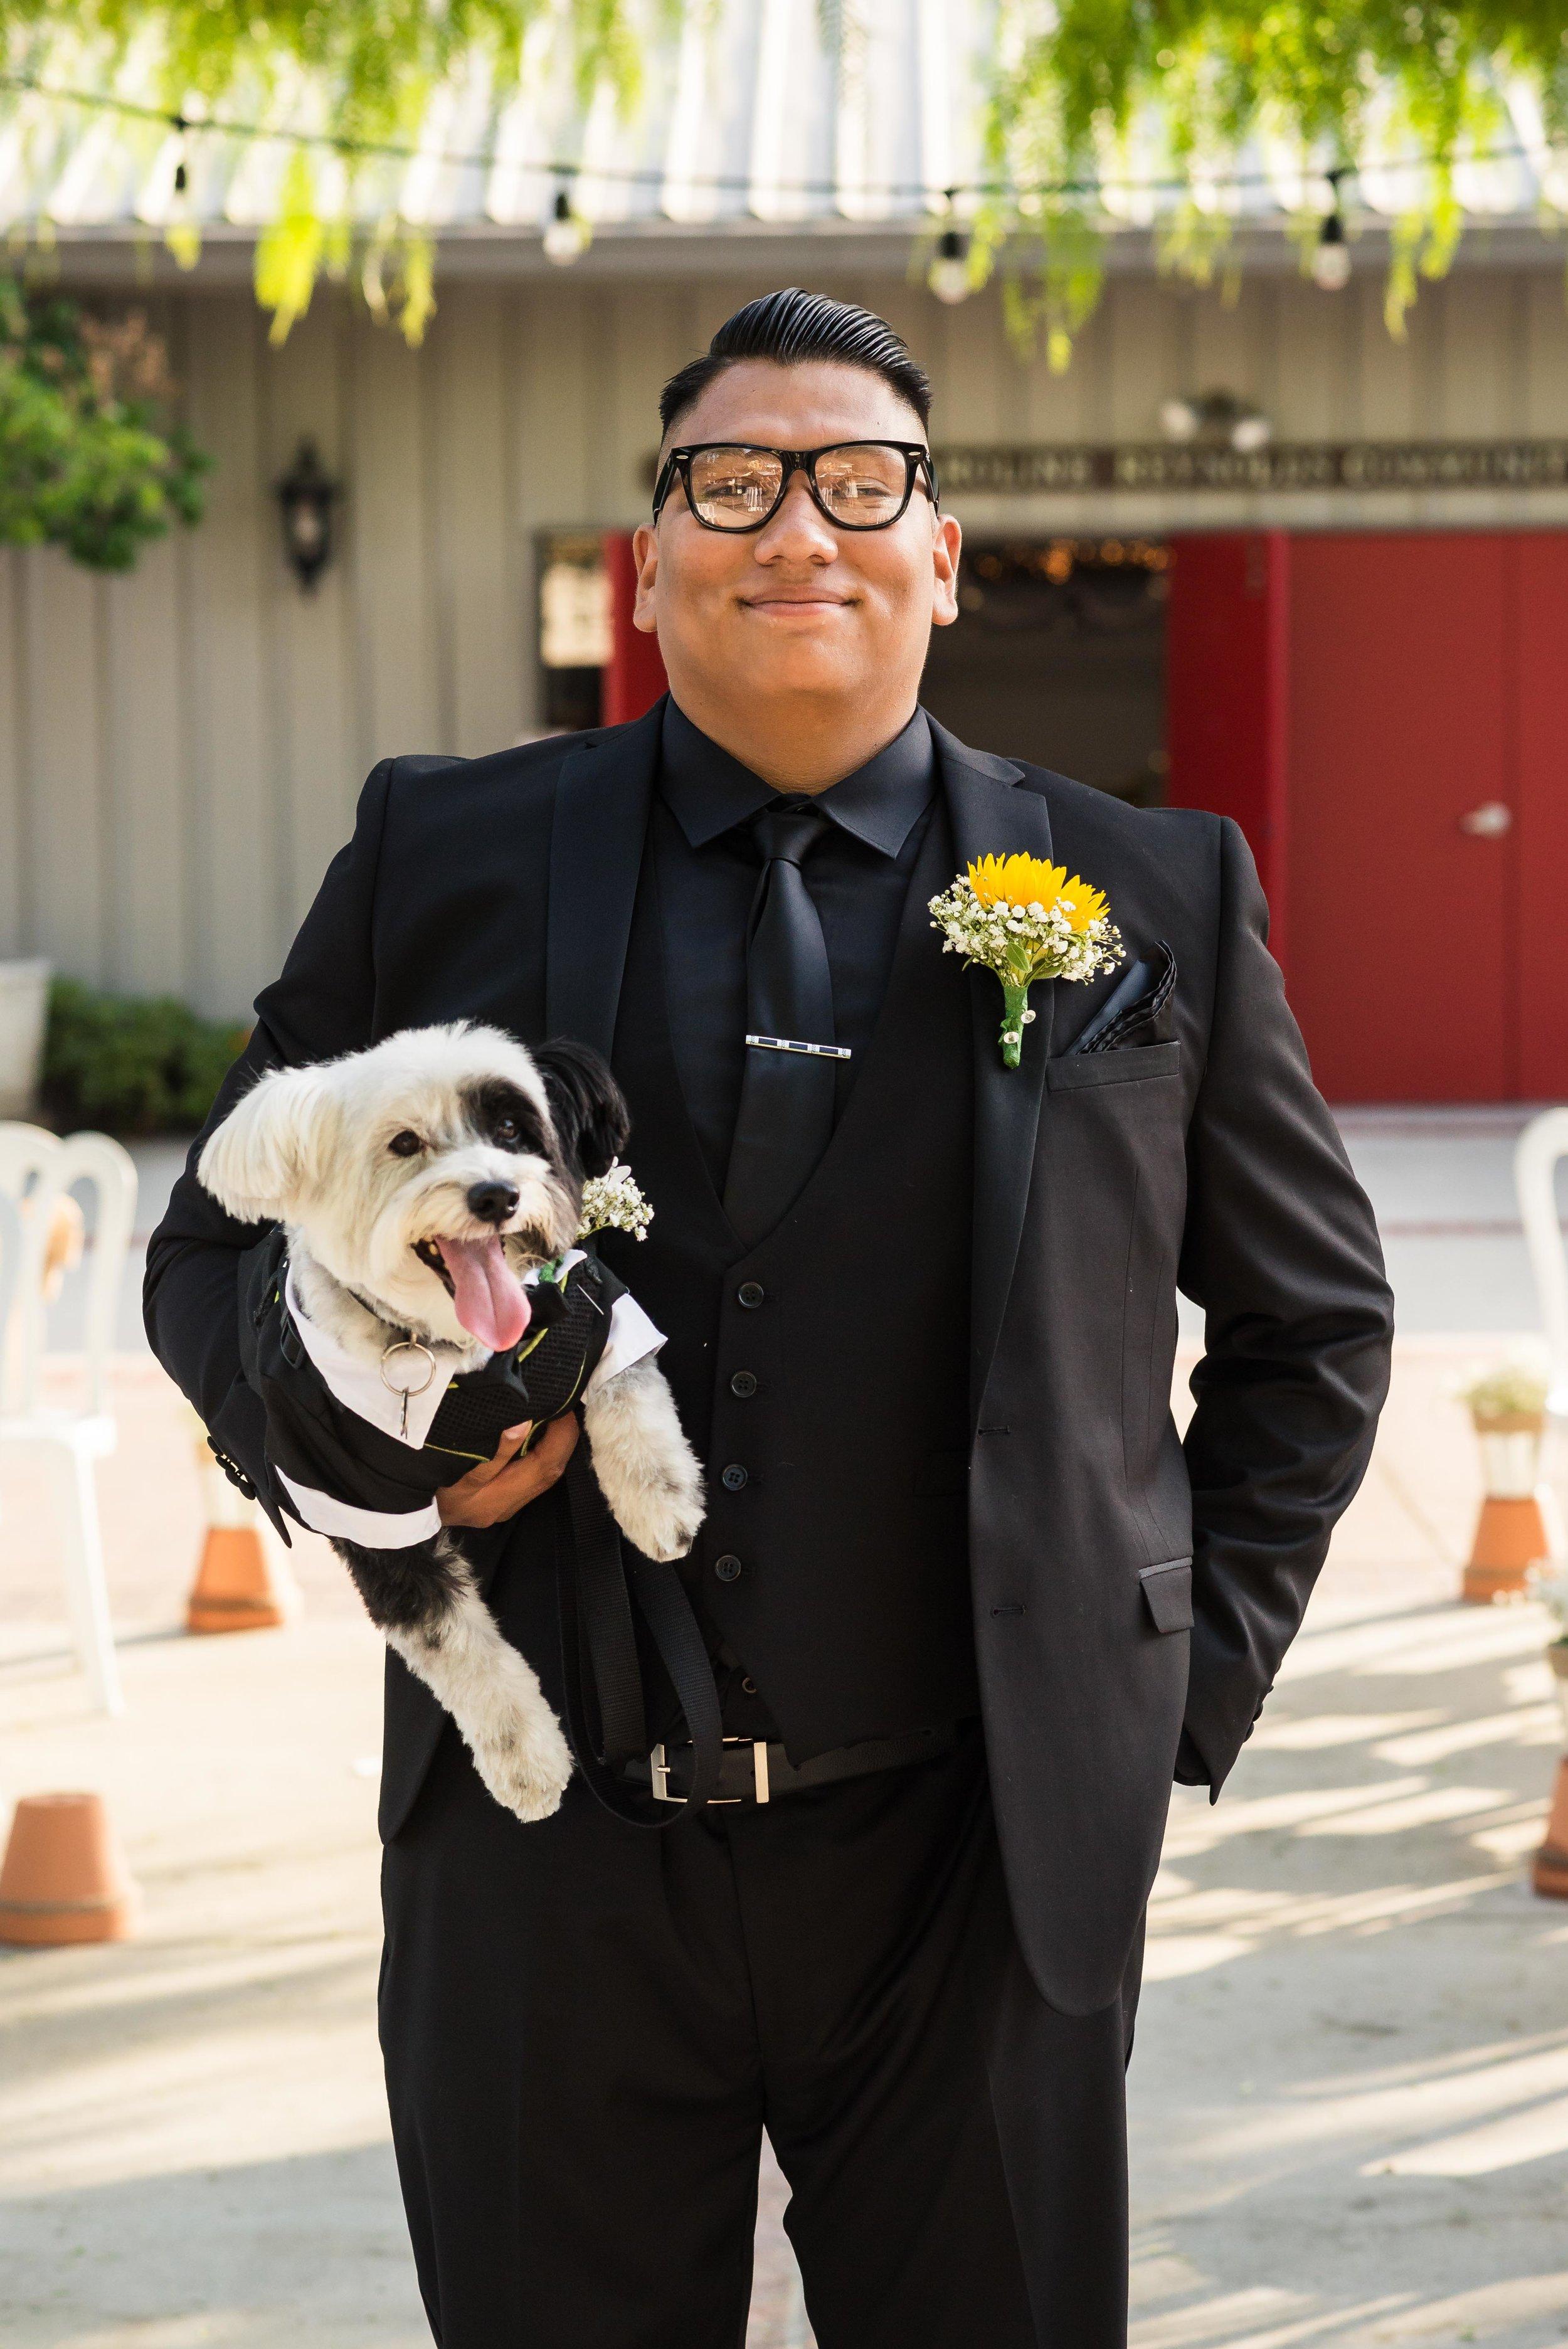 mexican_southern_california_wedding_joshuachun_photography-3.JPG